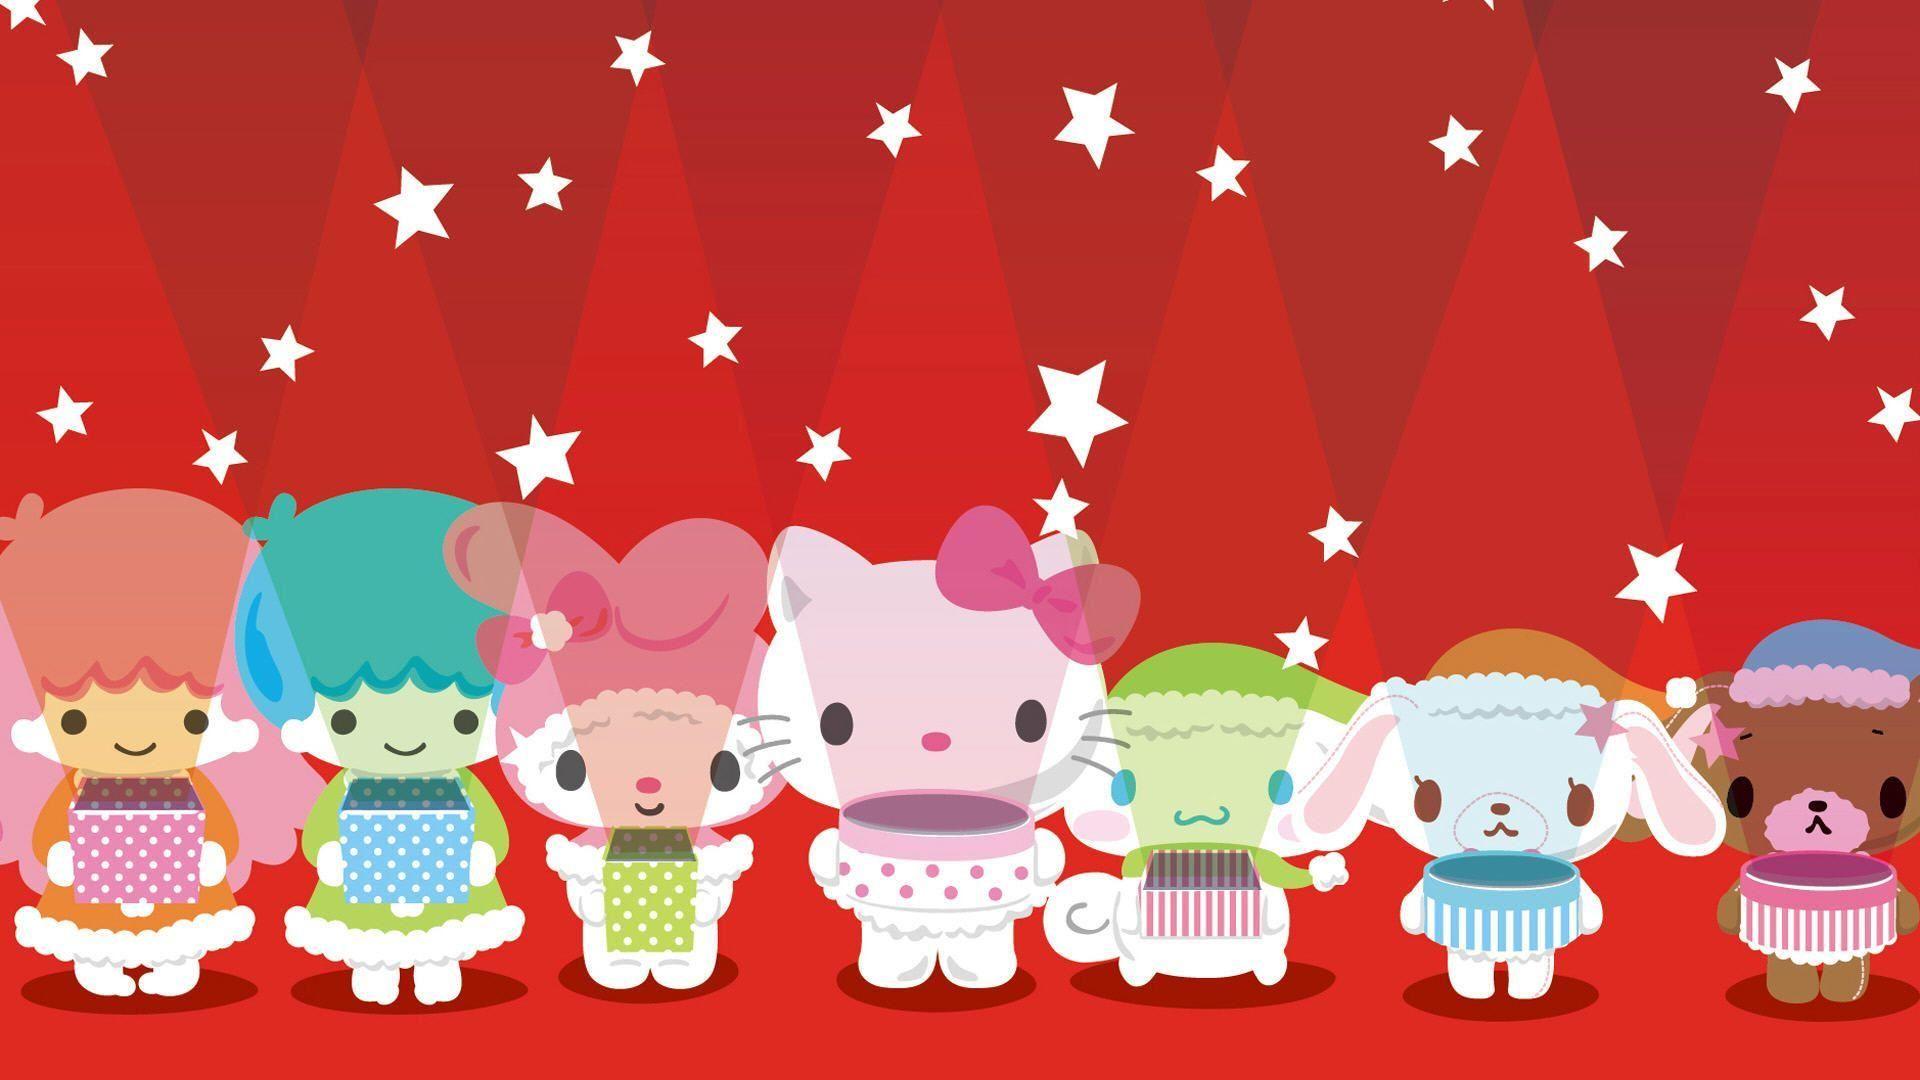 Popular Wallpaper Hello Kitty Holiday - 6a2c57eb4894ad036e985cc558c8f9fb  Trends_82317.jpg